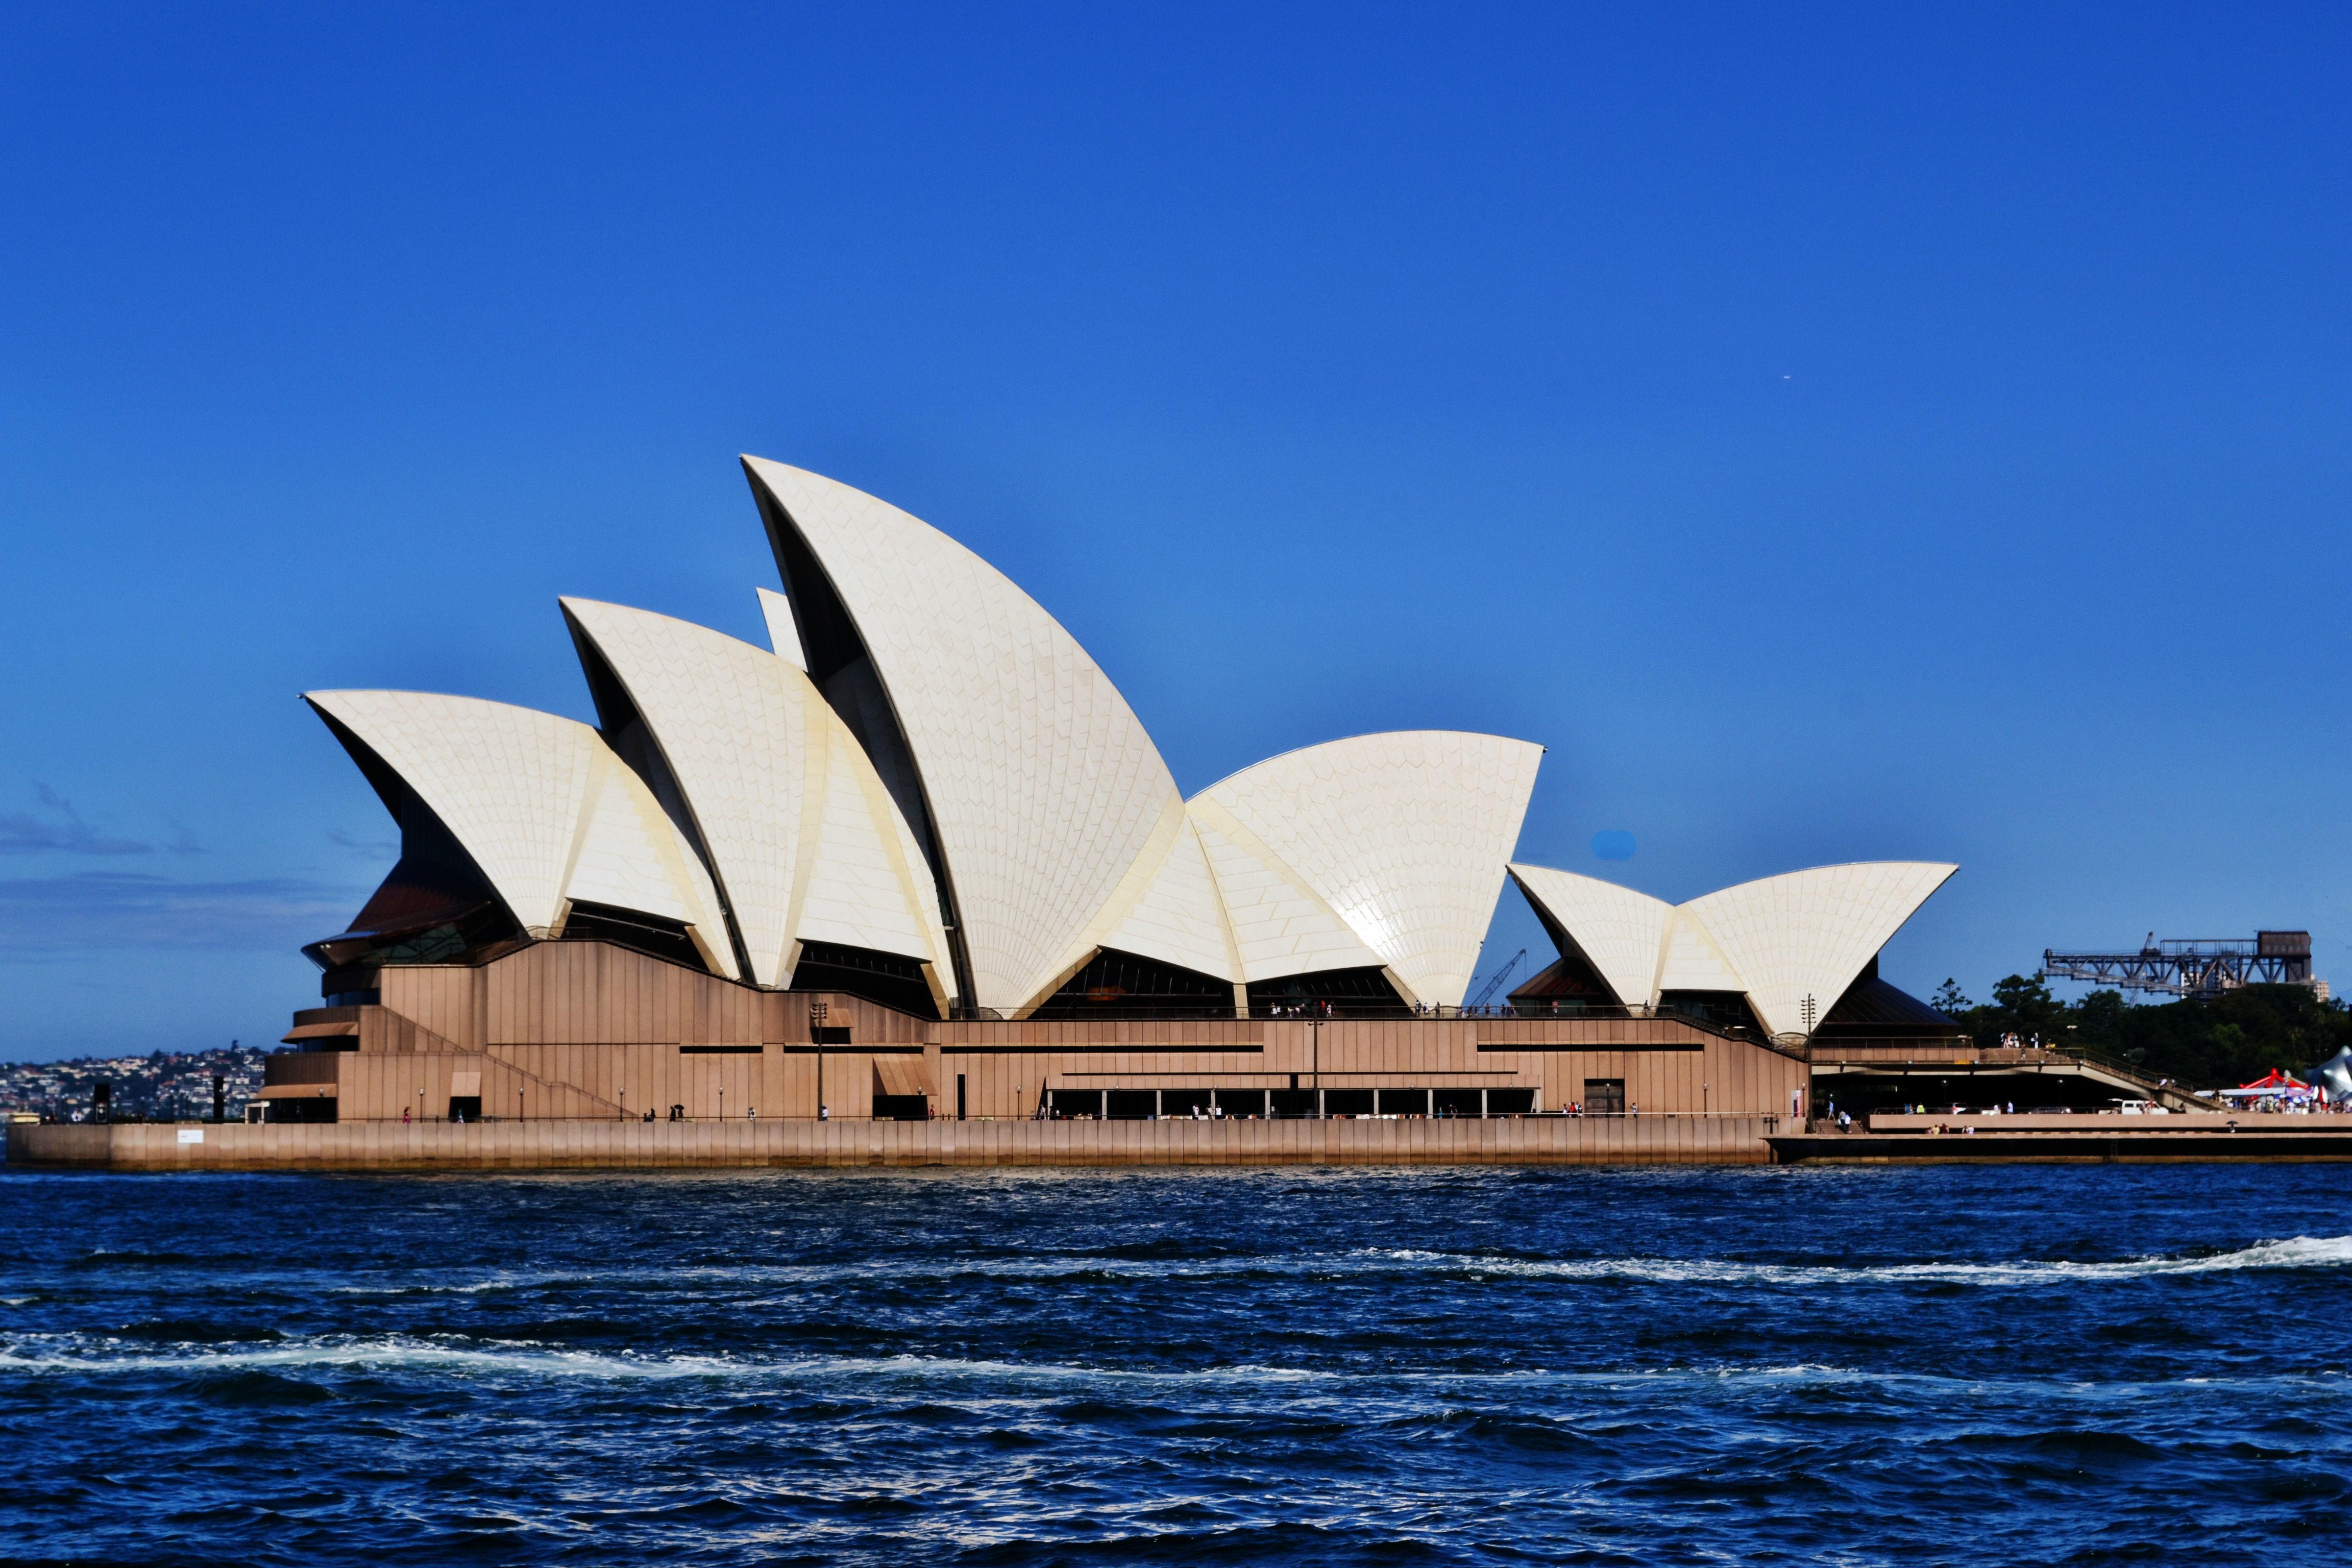 High Resolution Wallpaper | Sydney Opera House 4608x3072 px